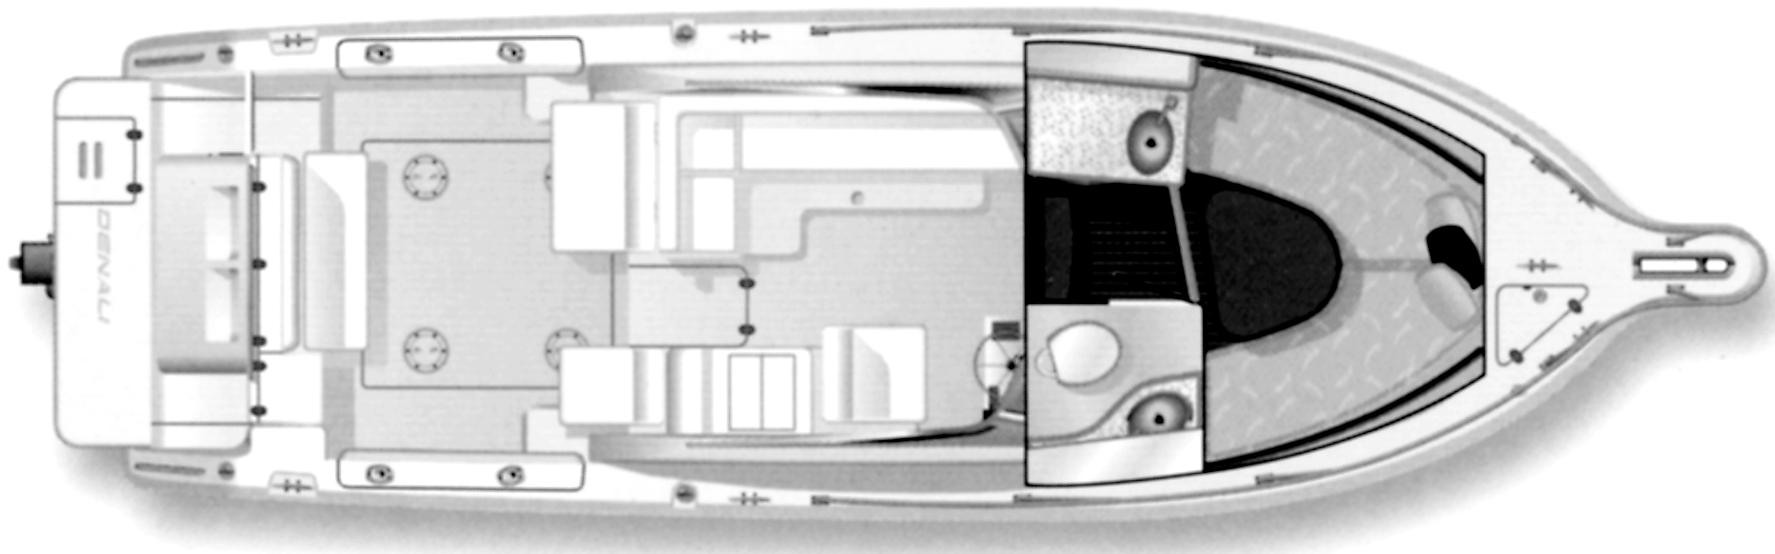 2860-2865 Denali Floor Plan 2